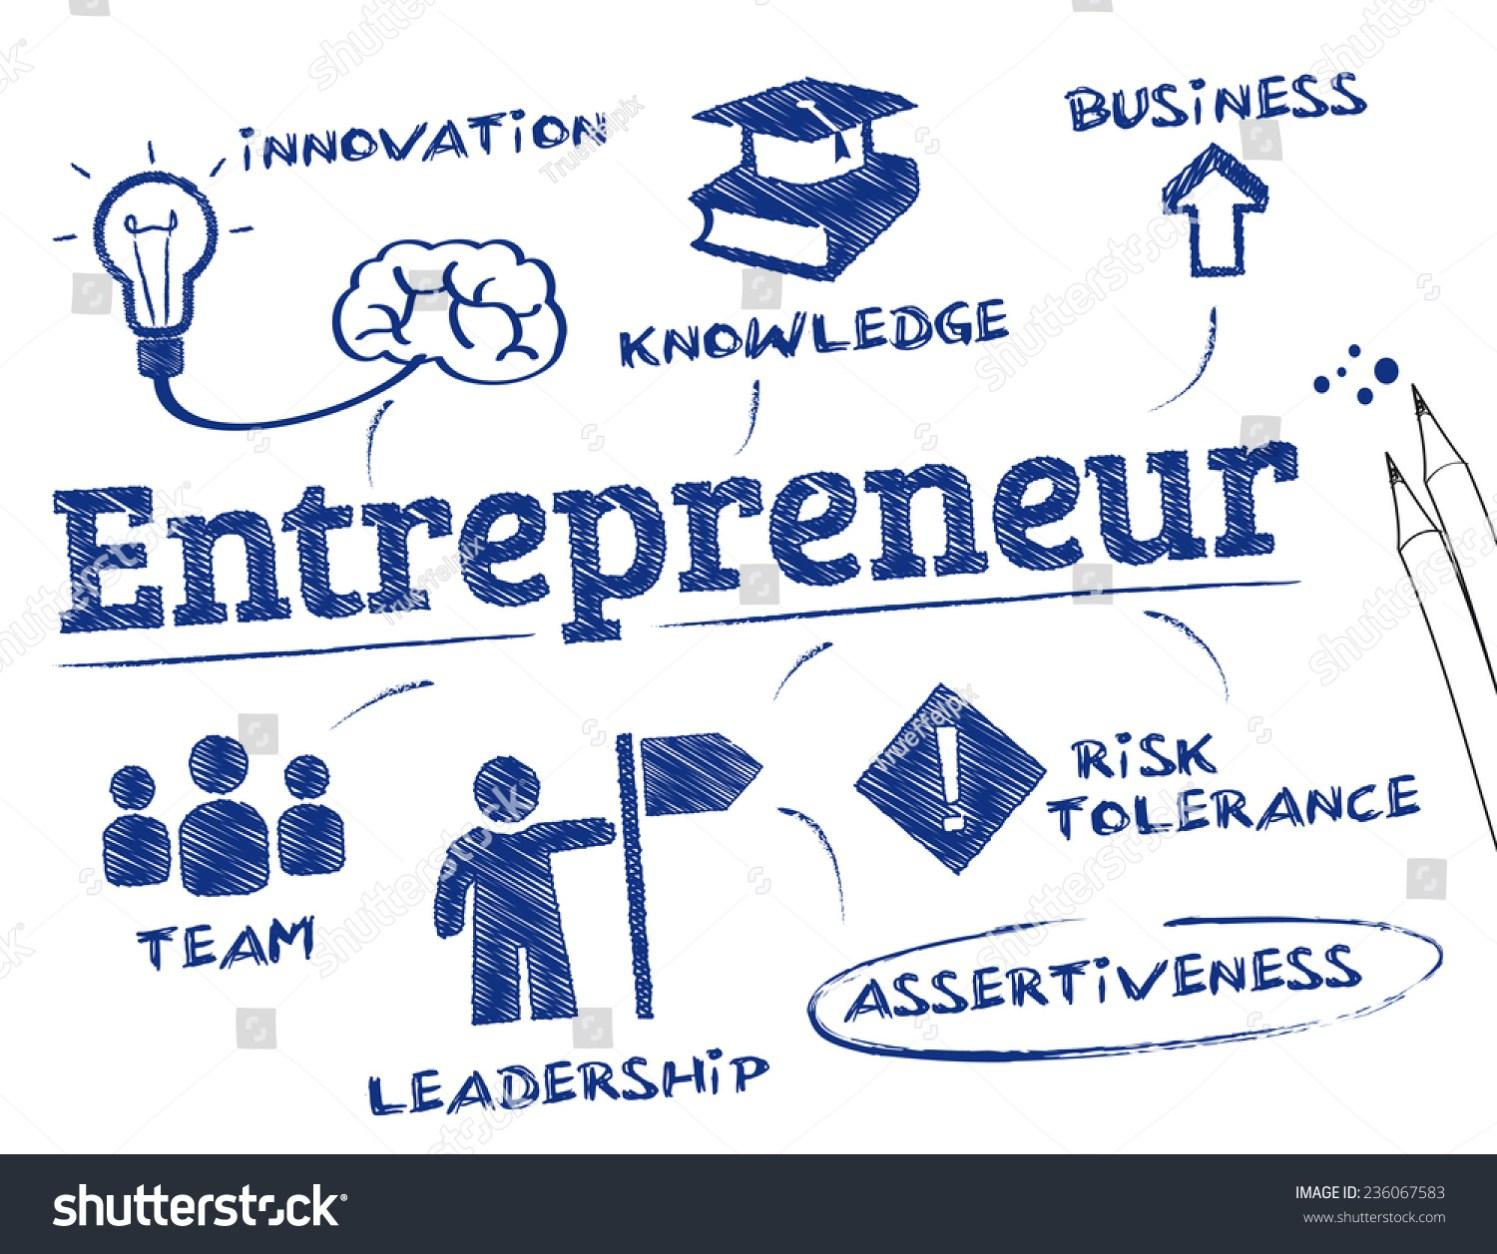 Entrepreneur Chart Keywords Icons Stock Vector (Royalty Free) 236067583